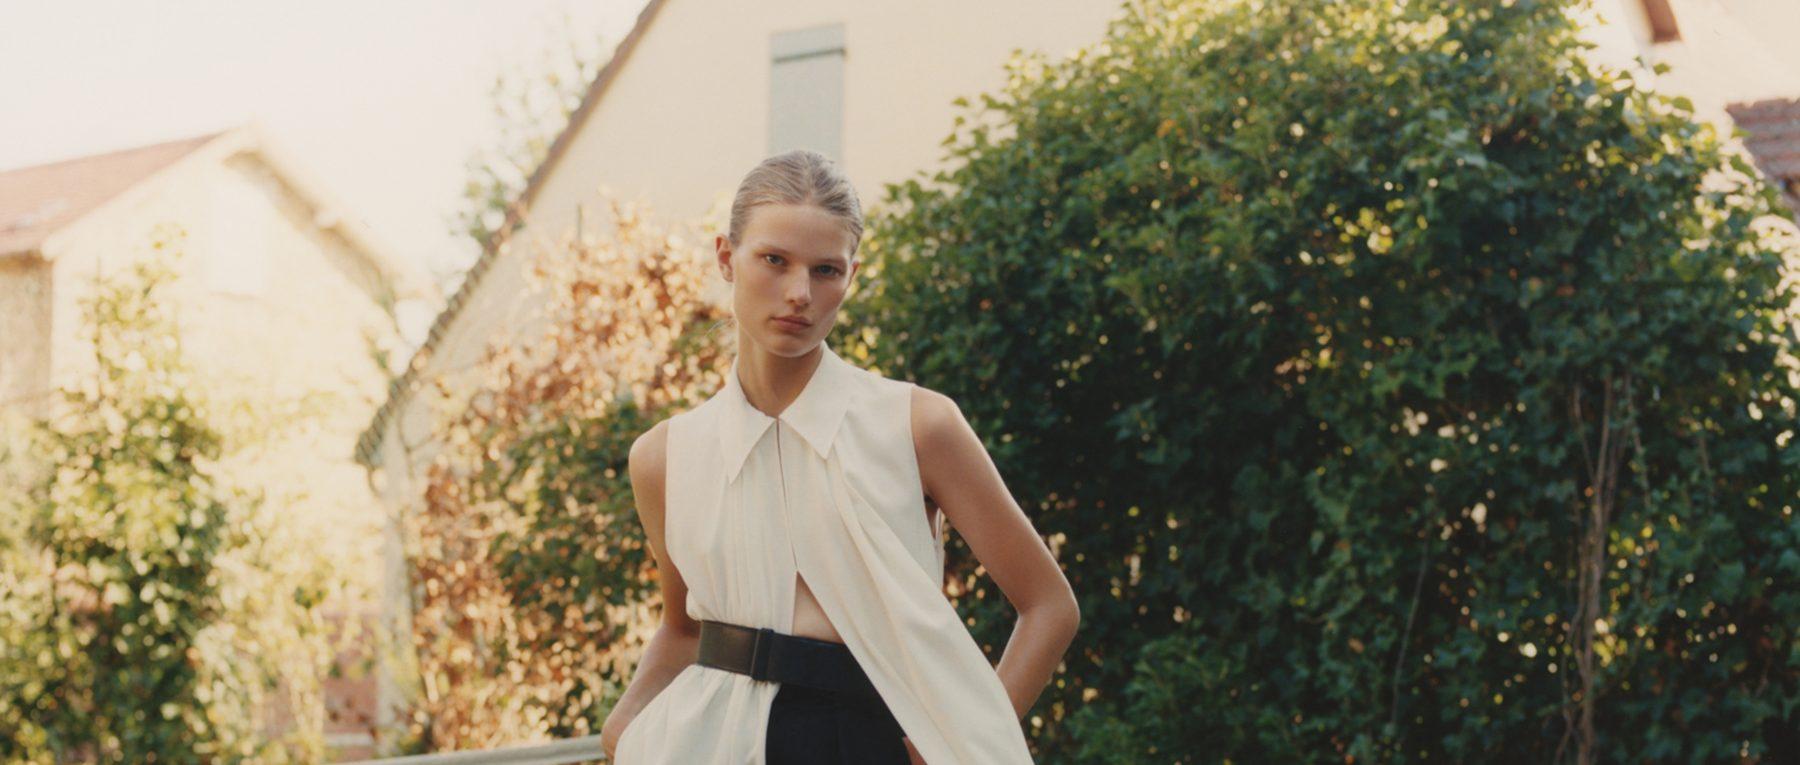 Adela Stenberg photographed by Benjamin Vnuk for Muse Magazine #50